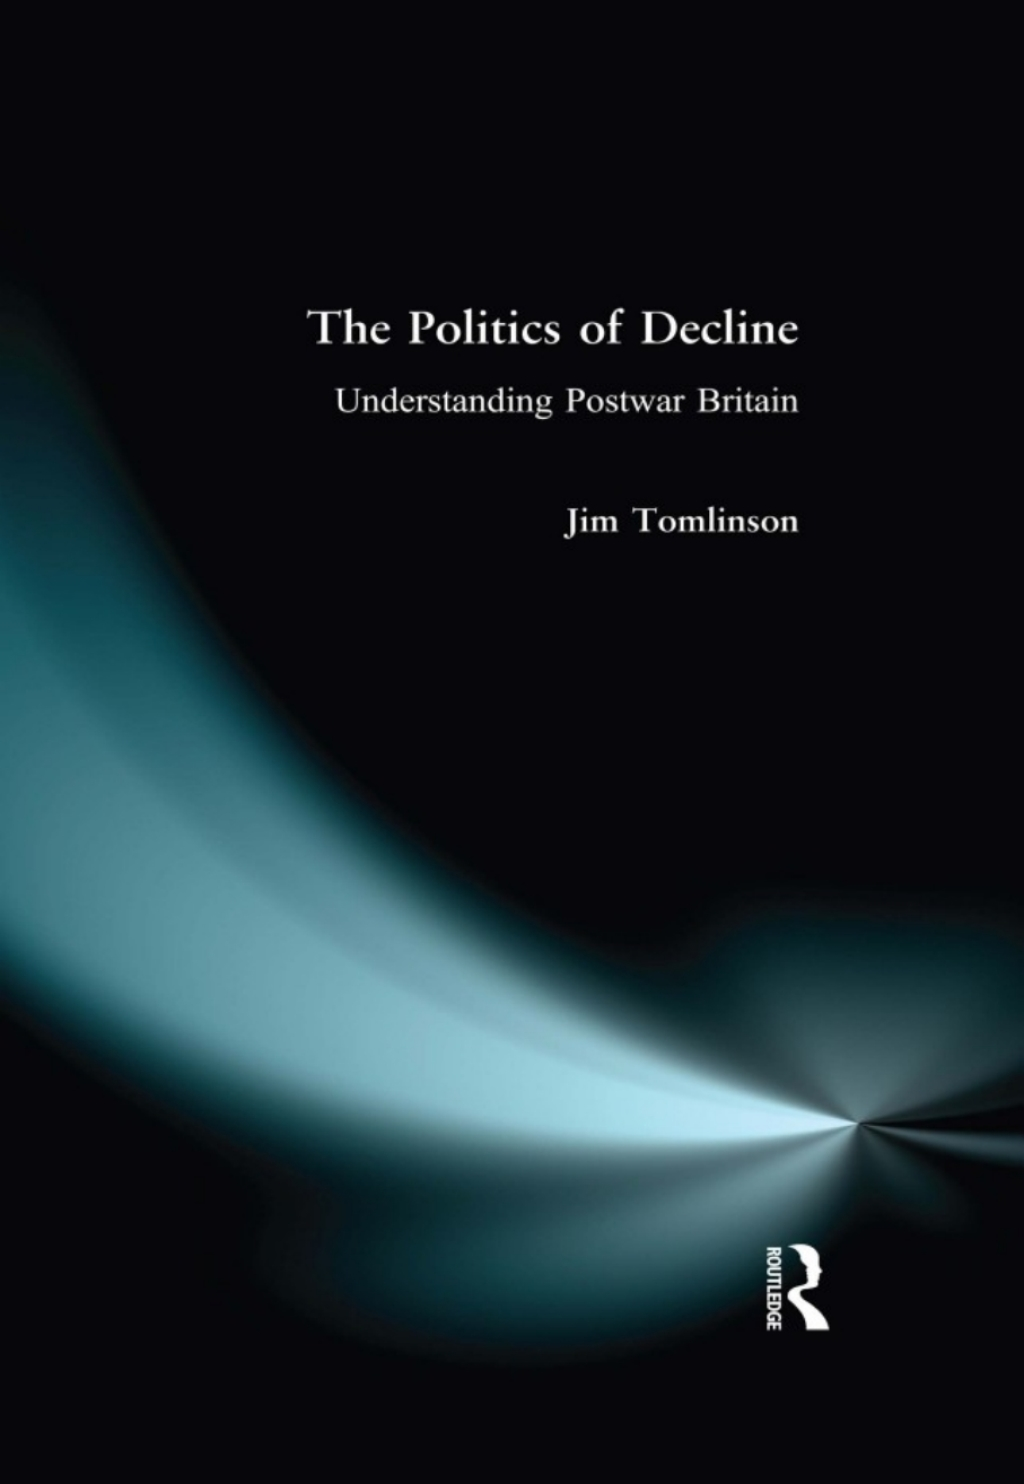 The Politics of Decline (eBook)